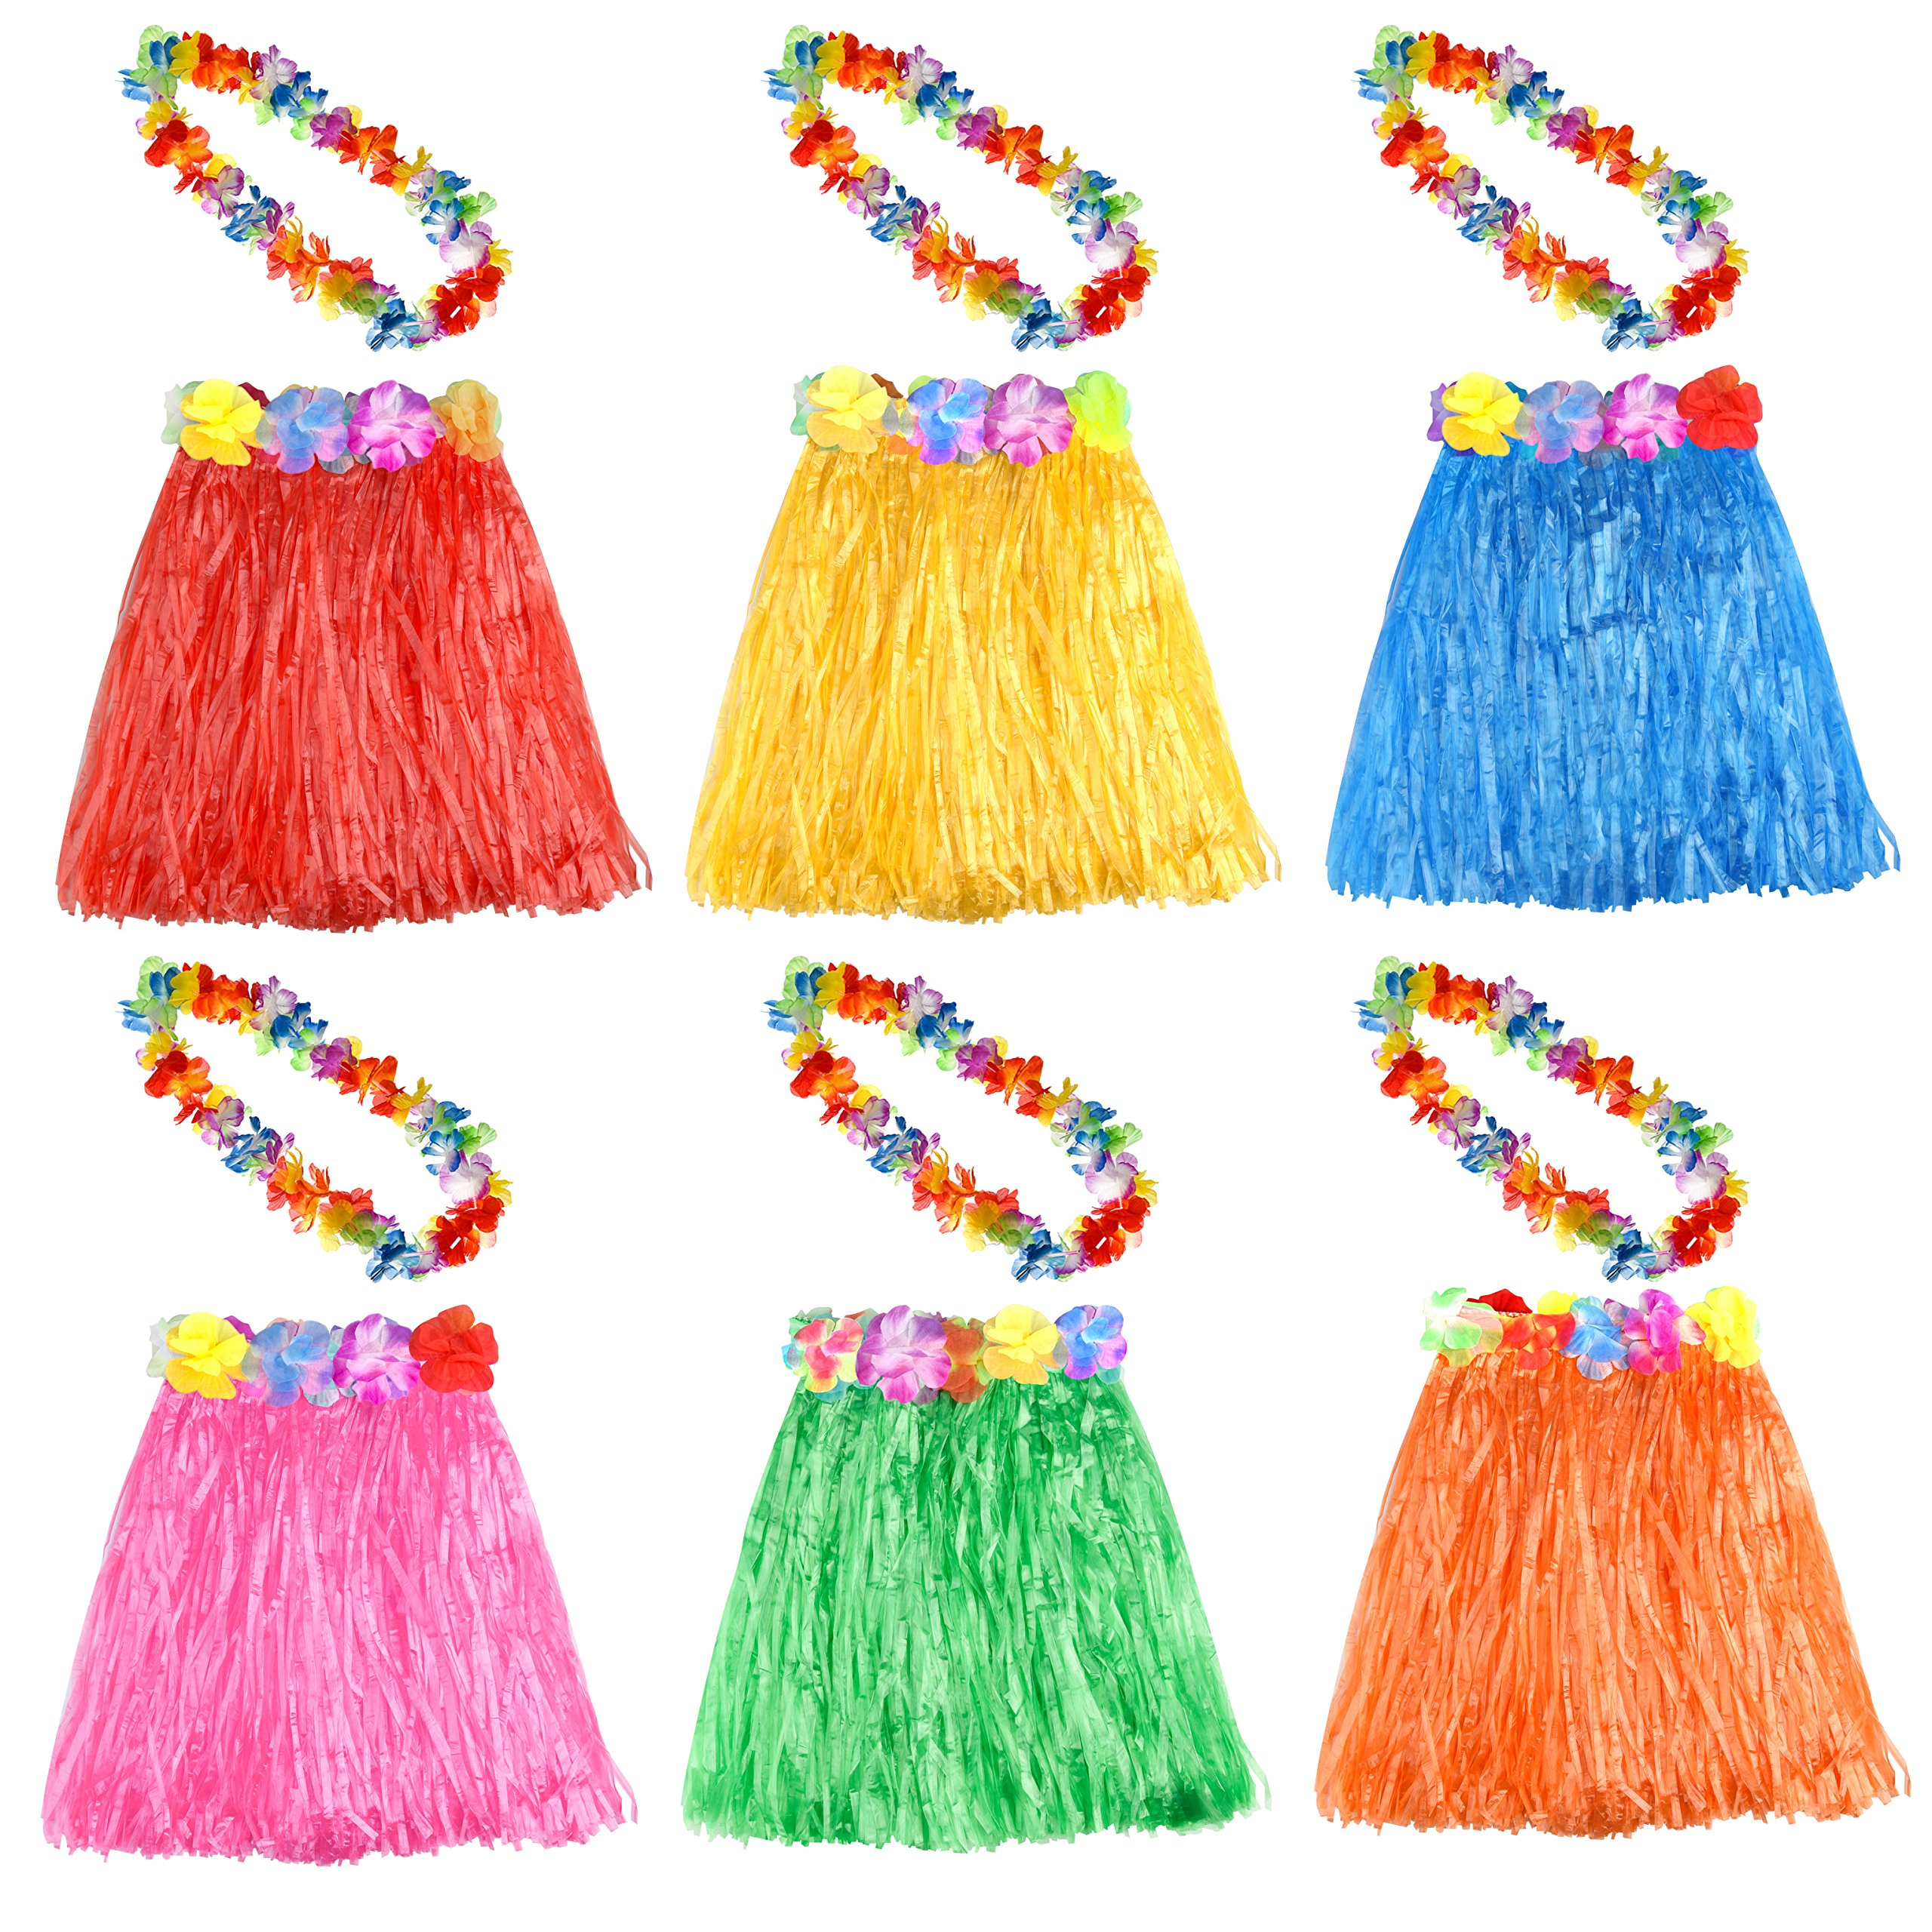 Women/'s Hawaiian Grass Hula Skirt Luau Flowers Leis Party Costume